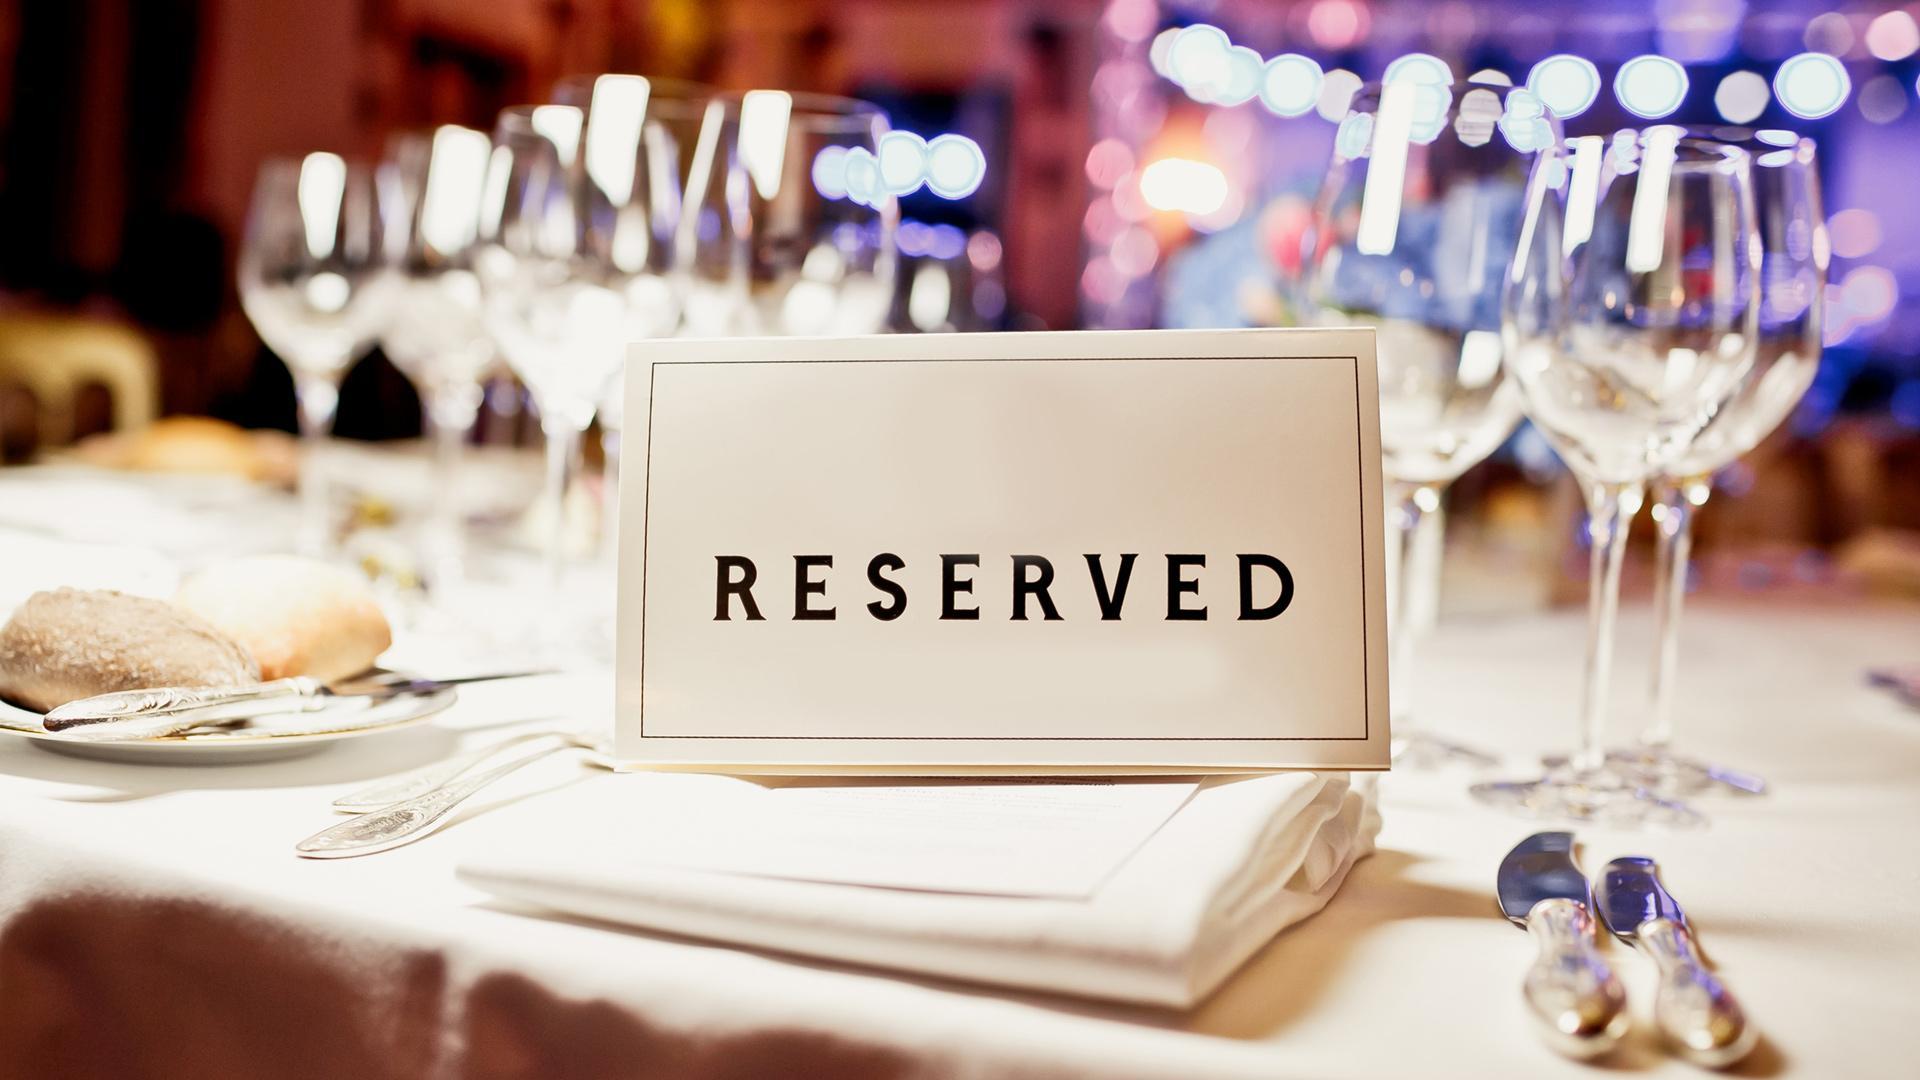 Private Event Management Leviticus Lifestyle